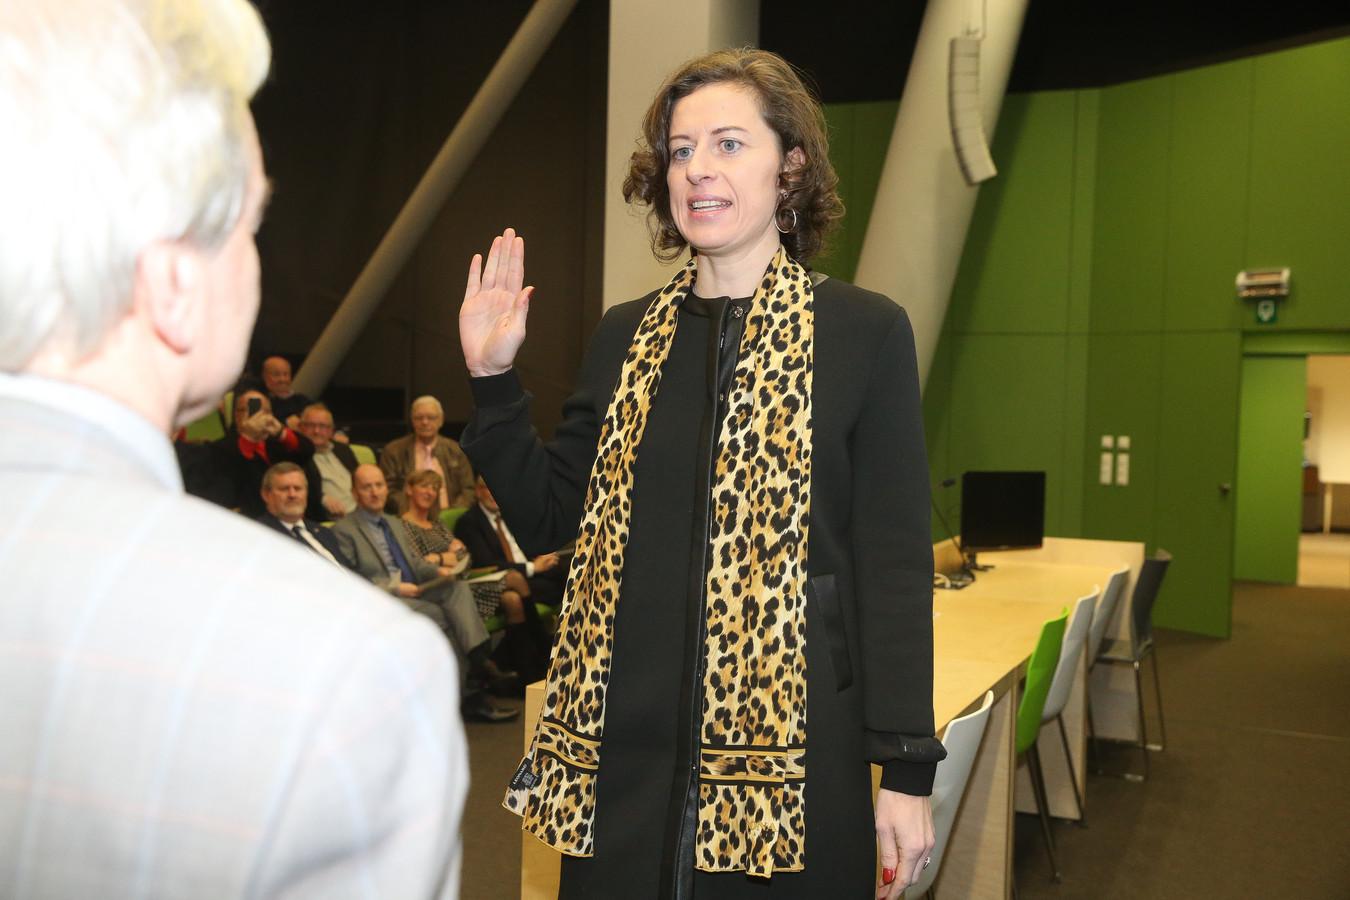 Eedaflegging burgemeester Horebeke, Cynthia Browaeys.